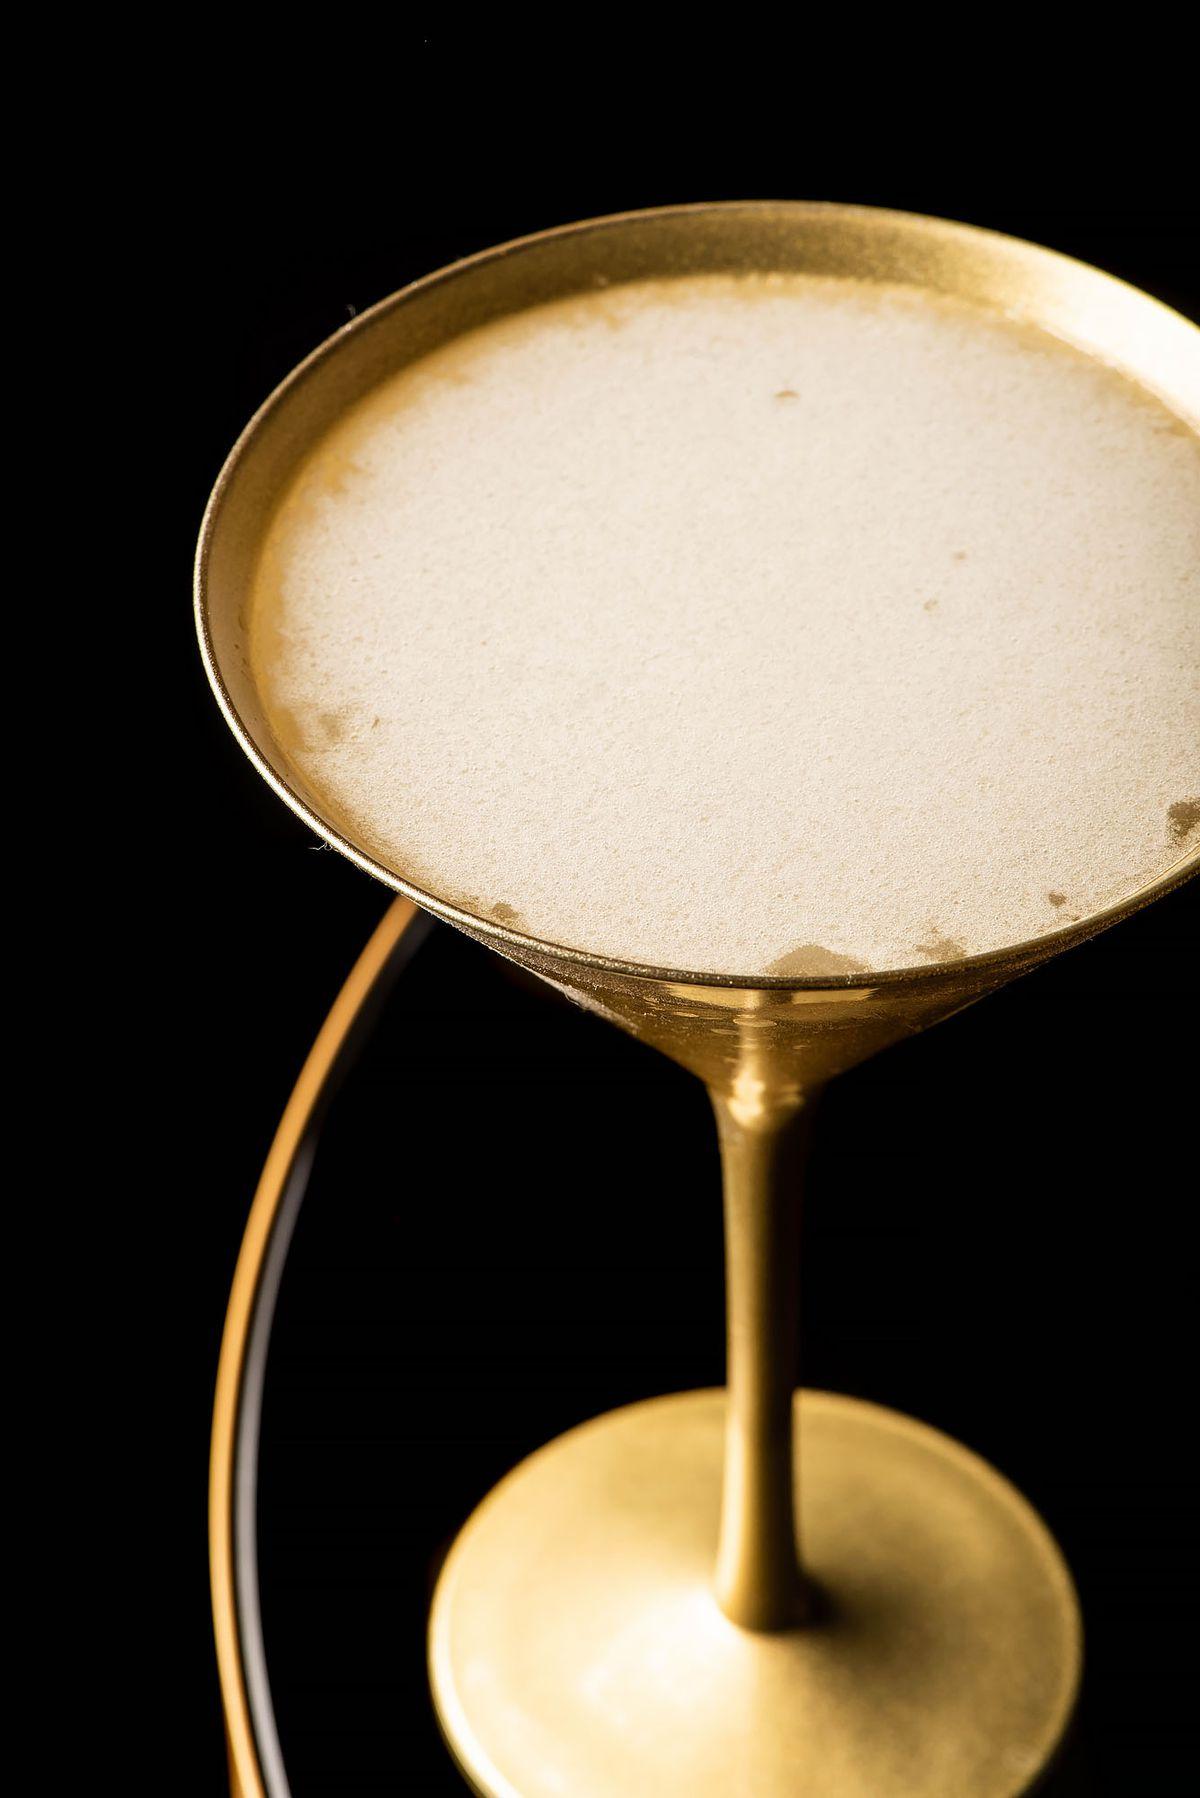 Cadillac margarita in a gold martini glass